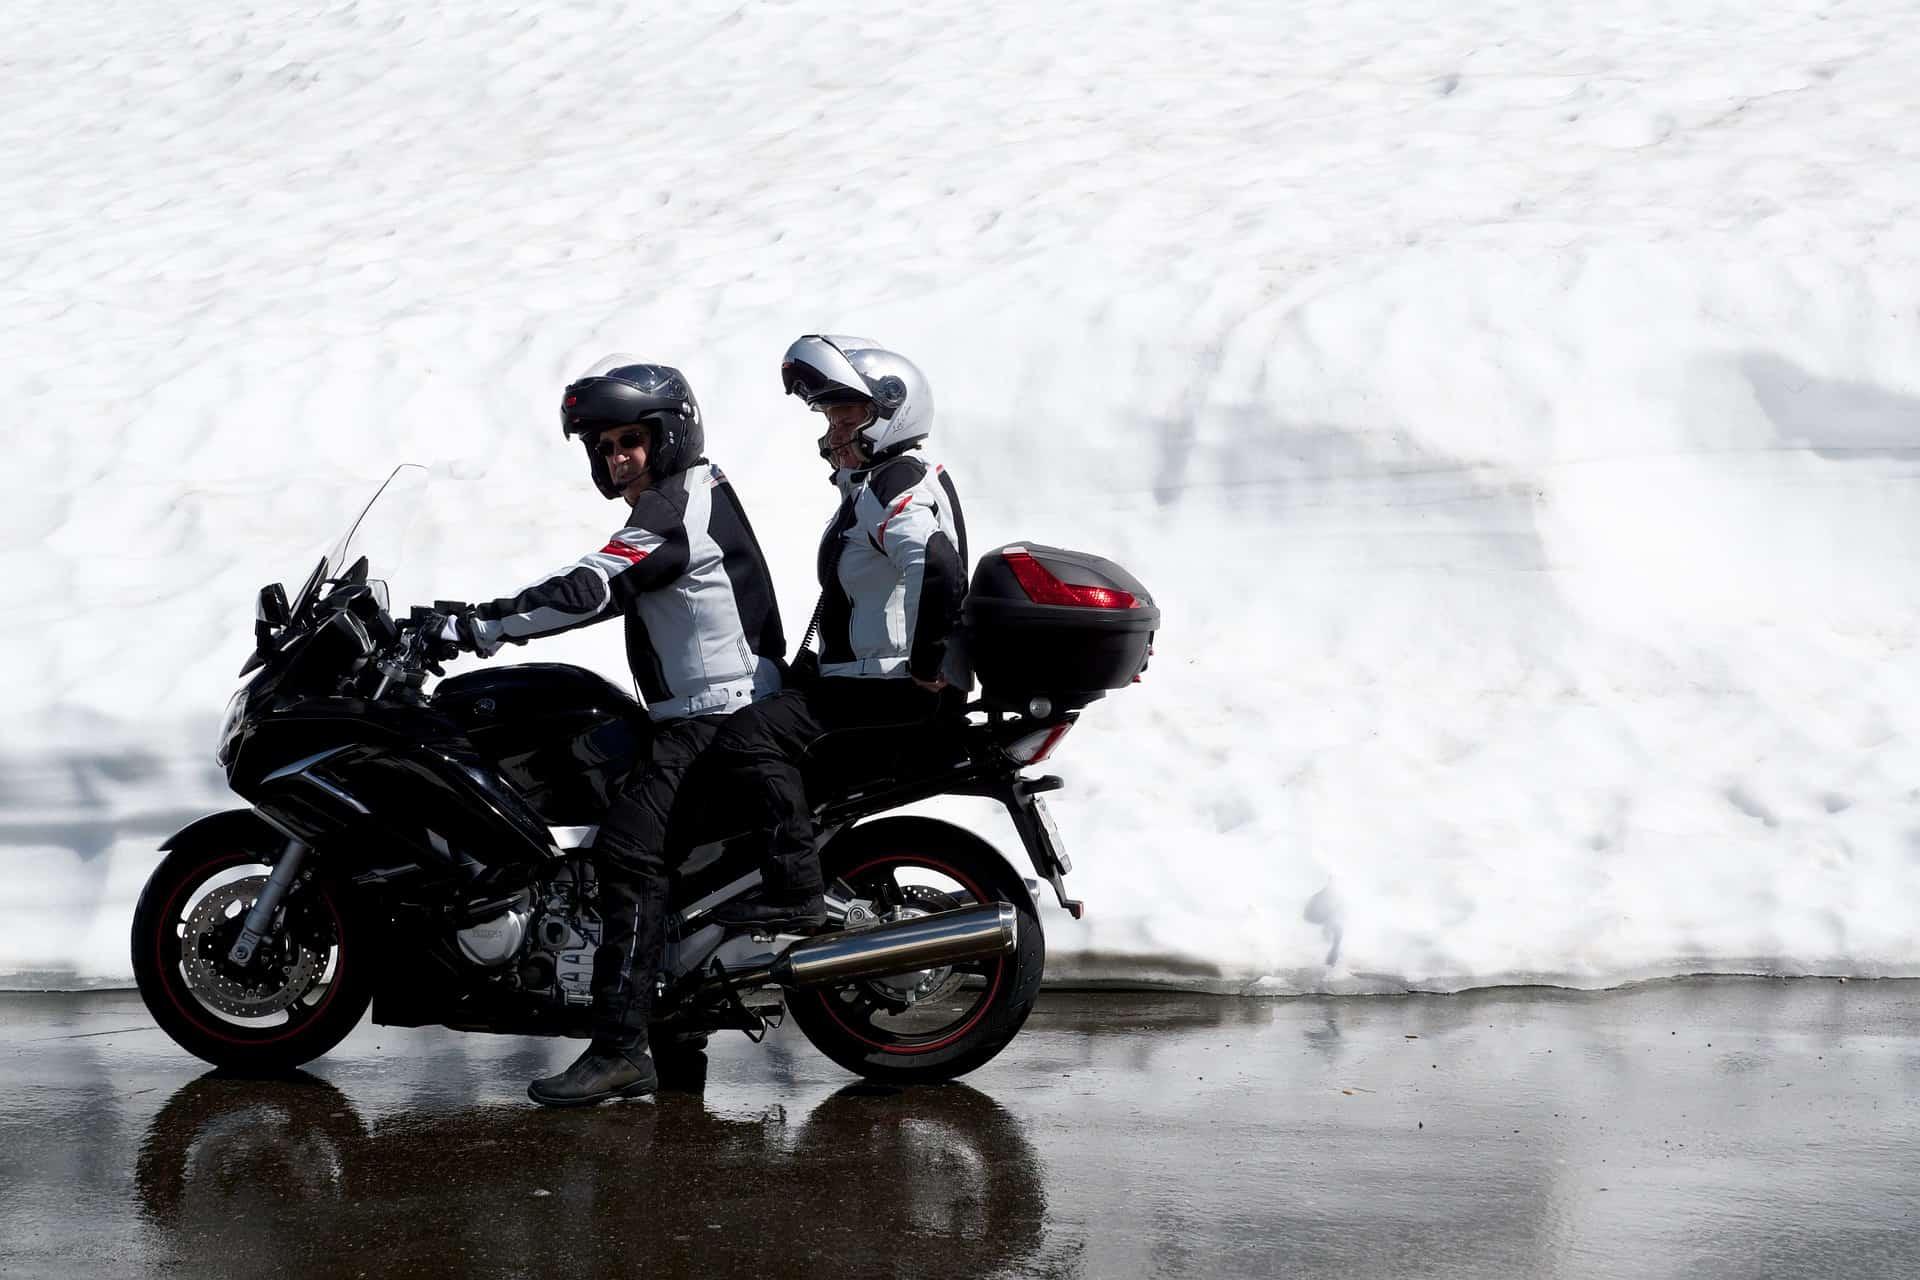 Jazda motocyklem zimą – krótki poradnik